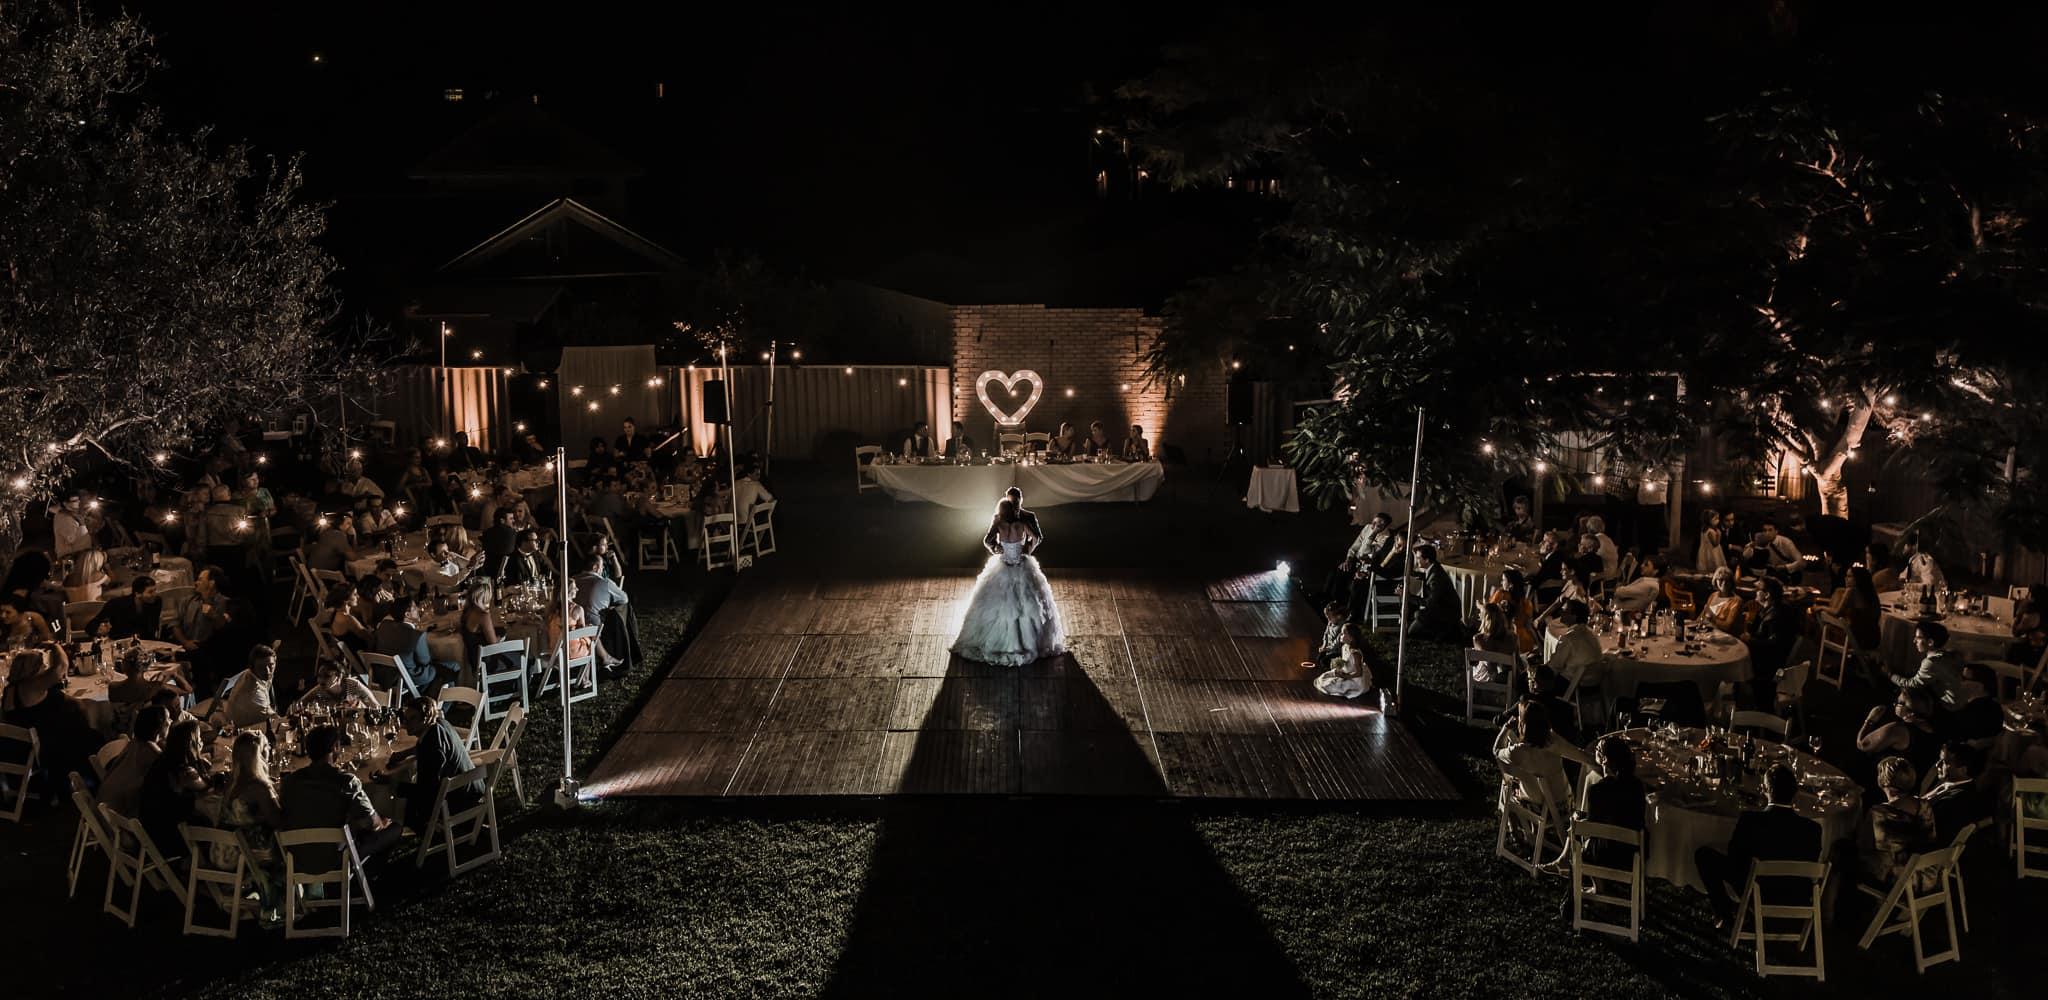 Perth Award Winning Documentary Wedding Photographer Adam Levi Browne photographs an aerial photograph of a bride and groom dancing in the backyard DIY wedding